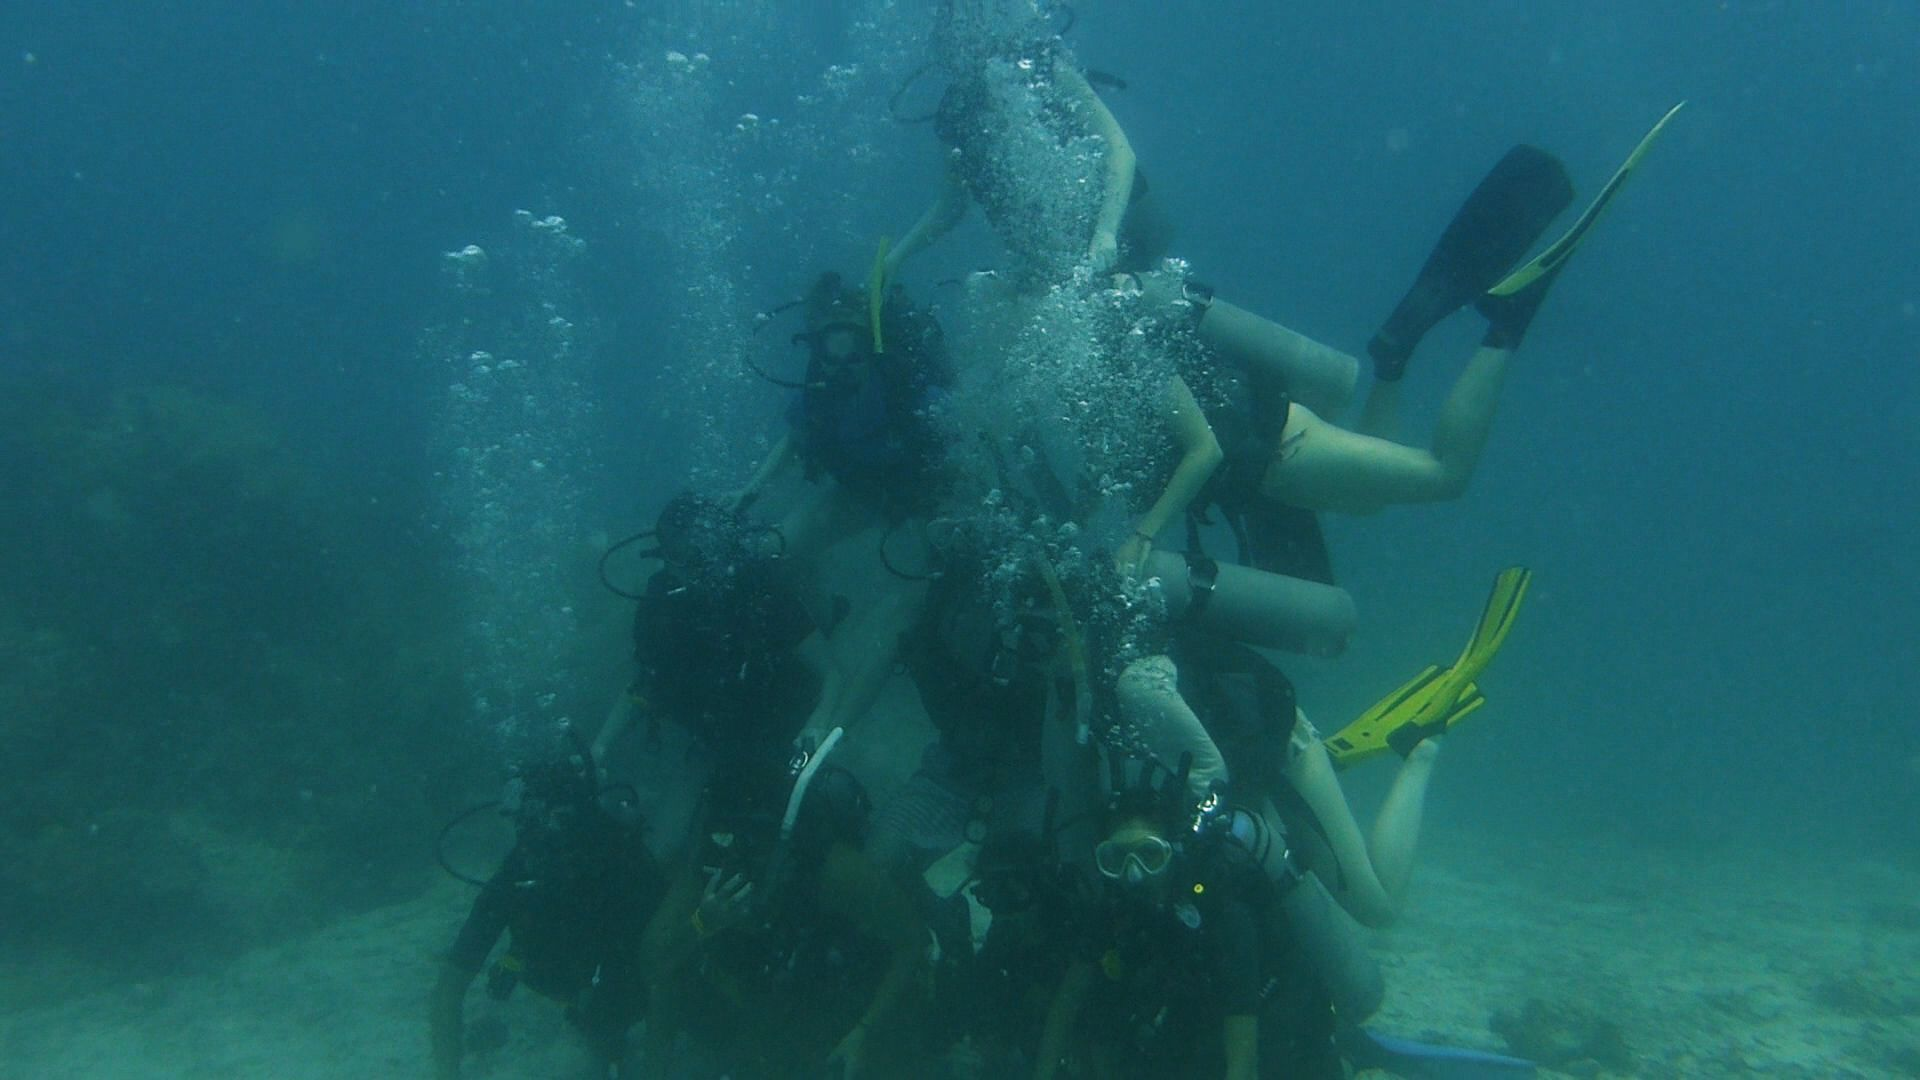 underwater scuba diving fun